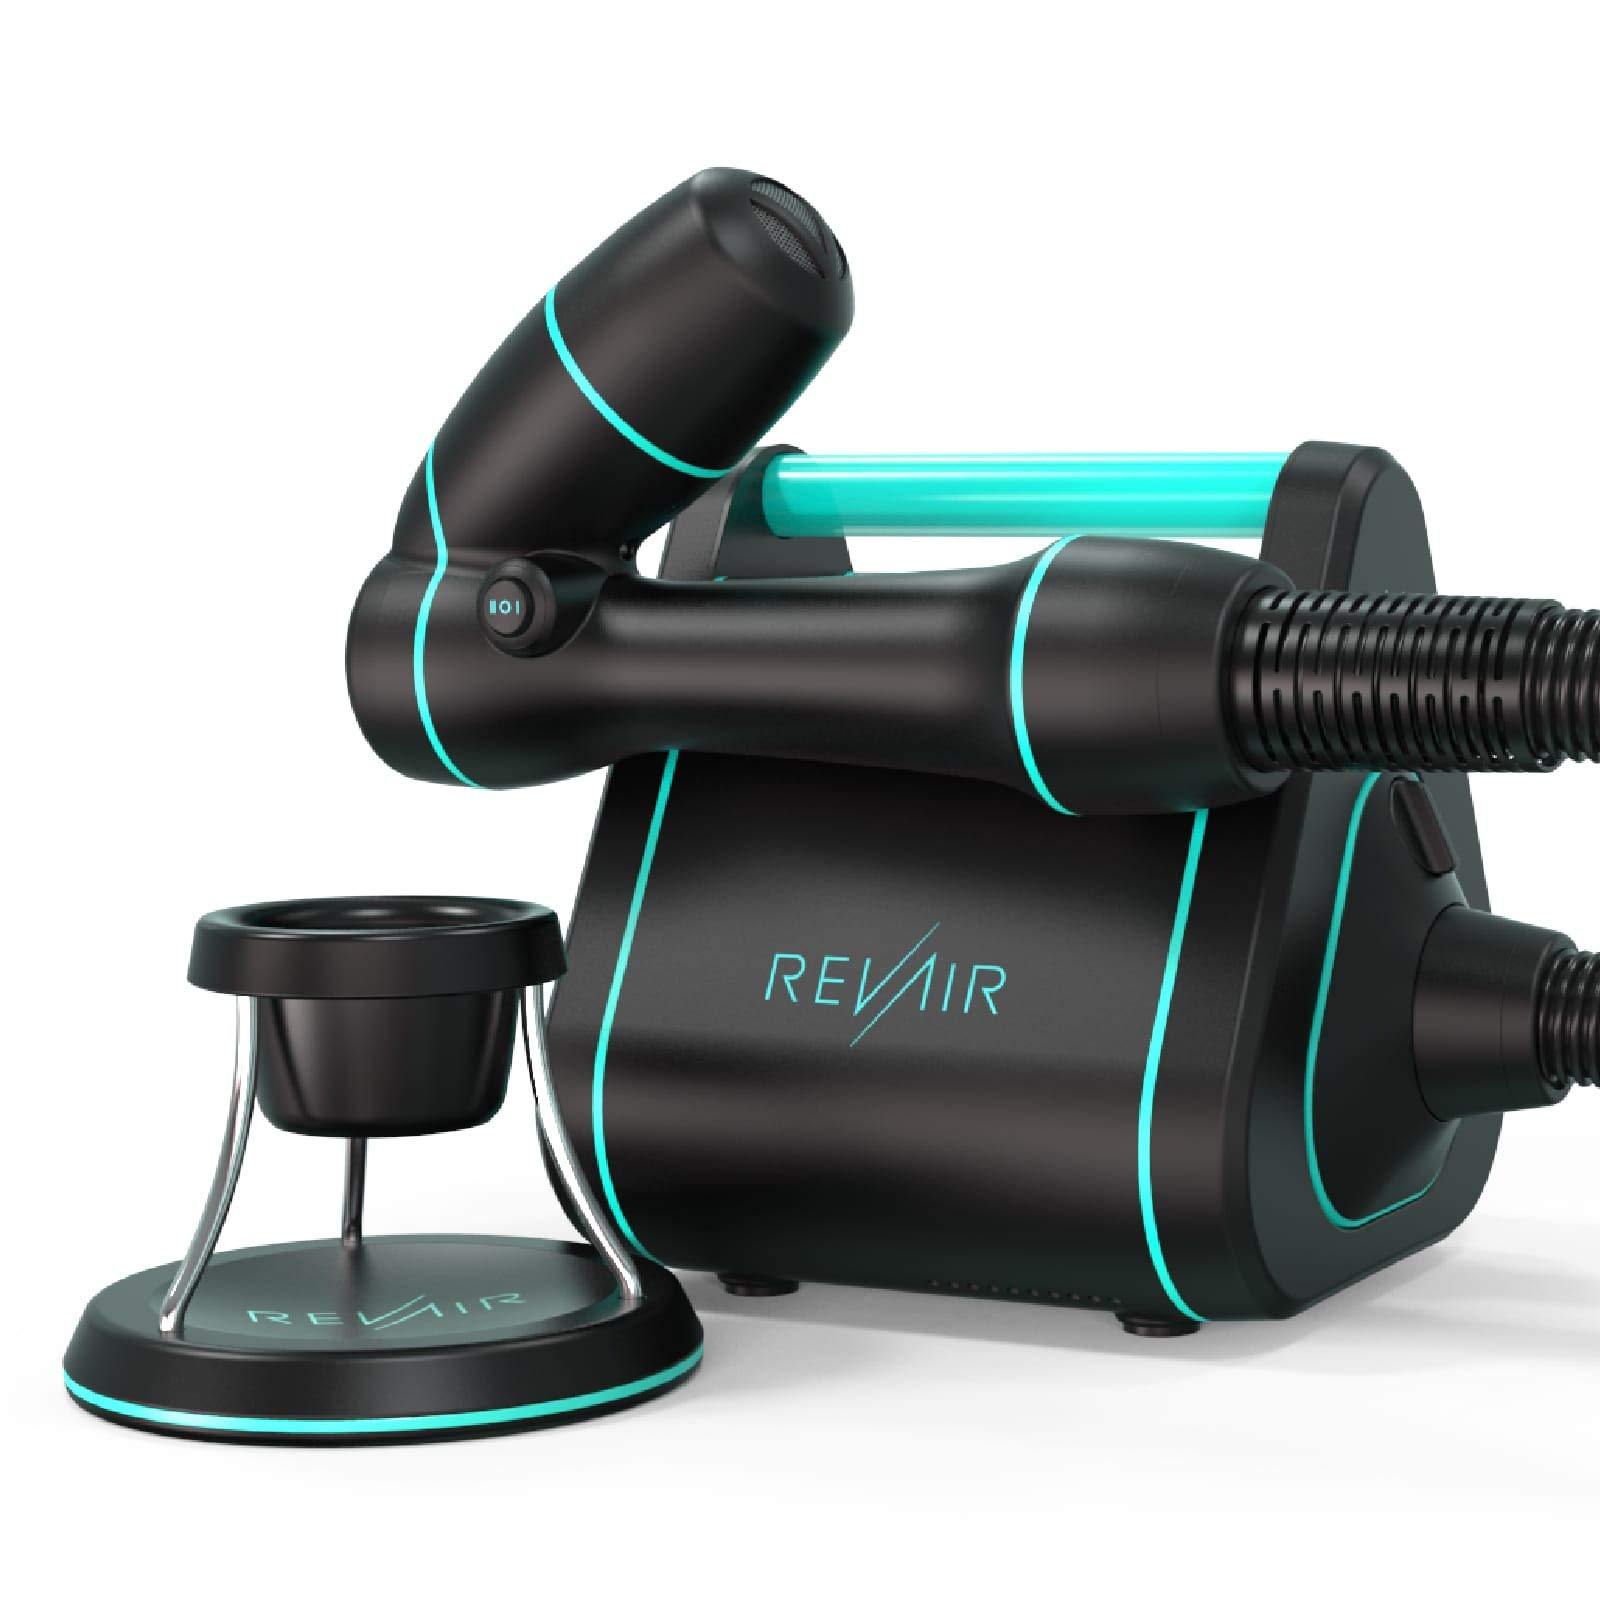 REVAIR Reverse-Air Hair Dryer   Easily Dry and Straighten Hair